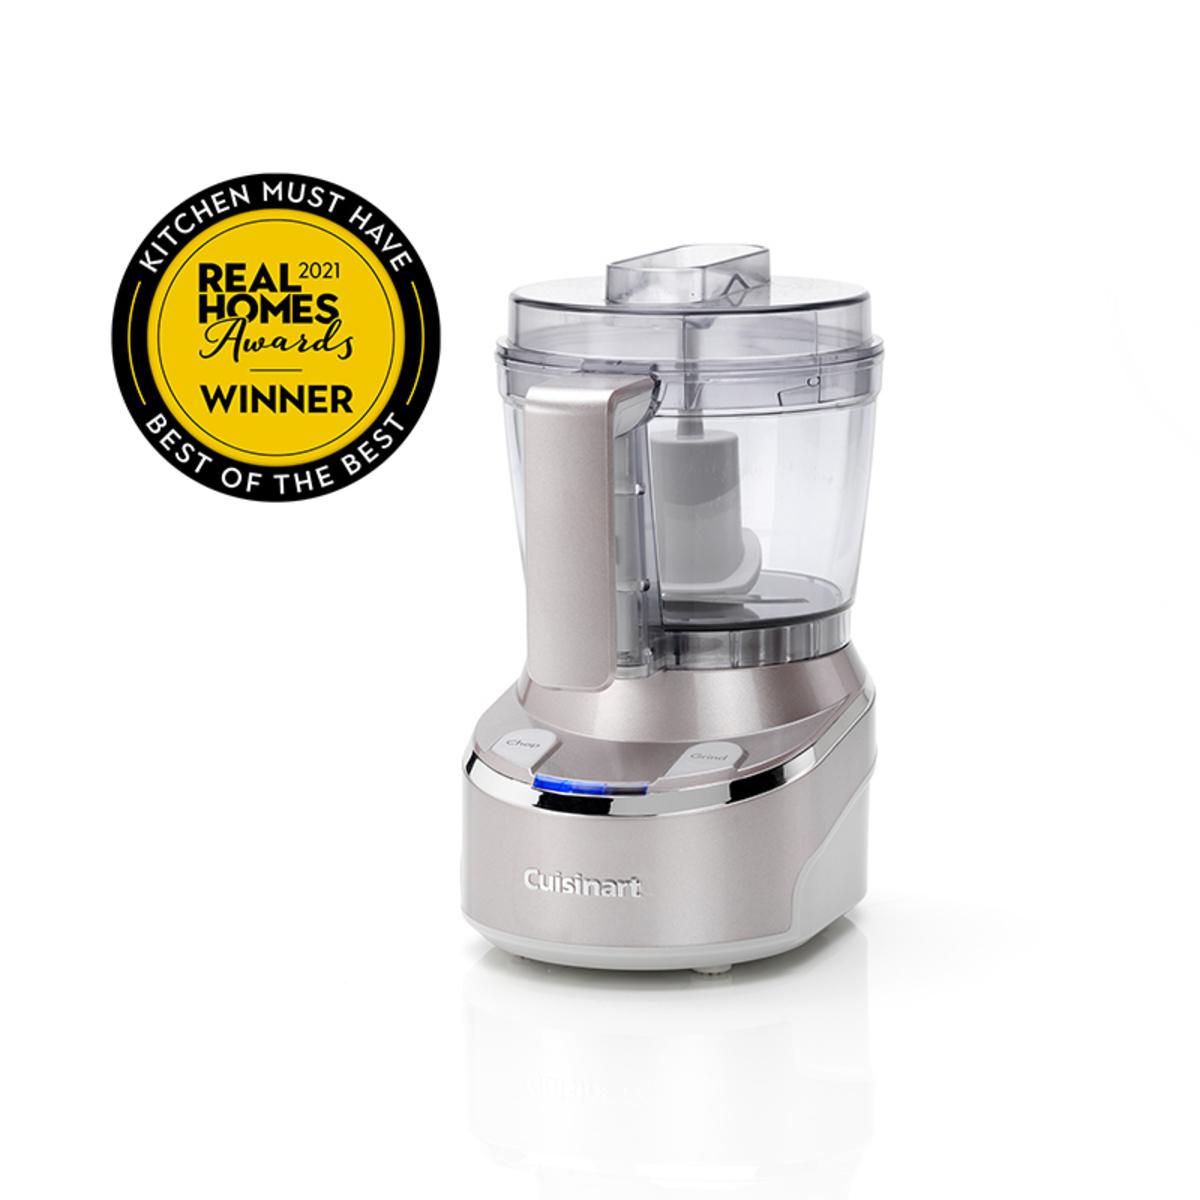 Image of Cuisinart RMC100U Cordless Mini Prep Pro